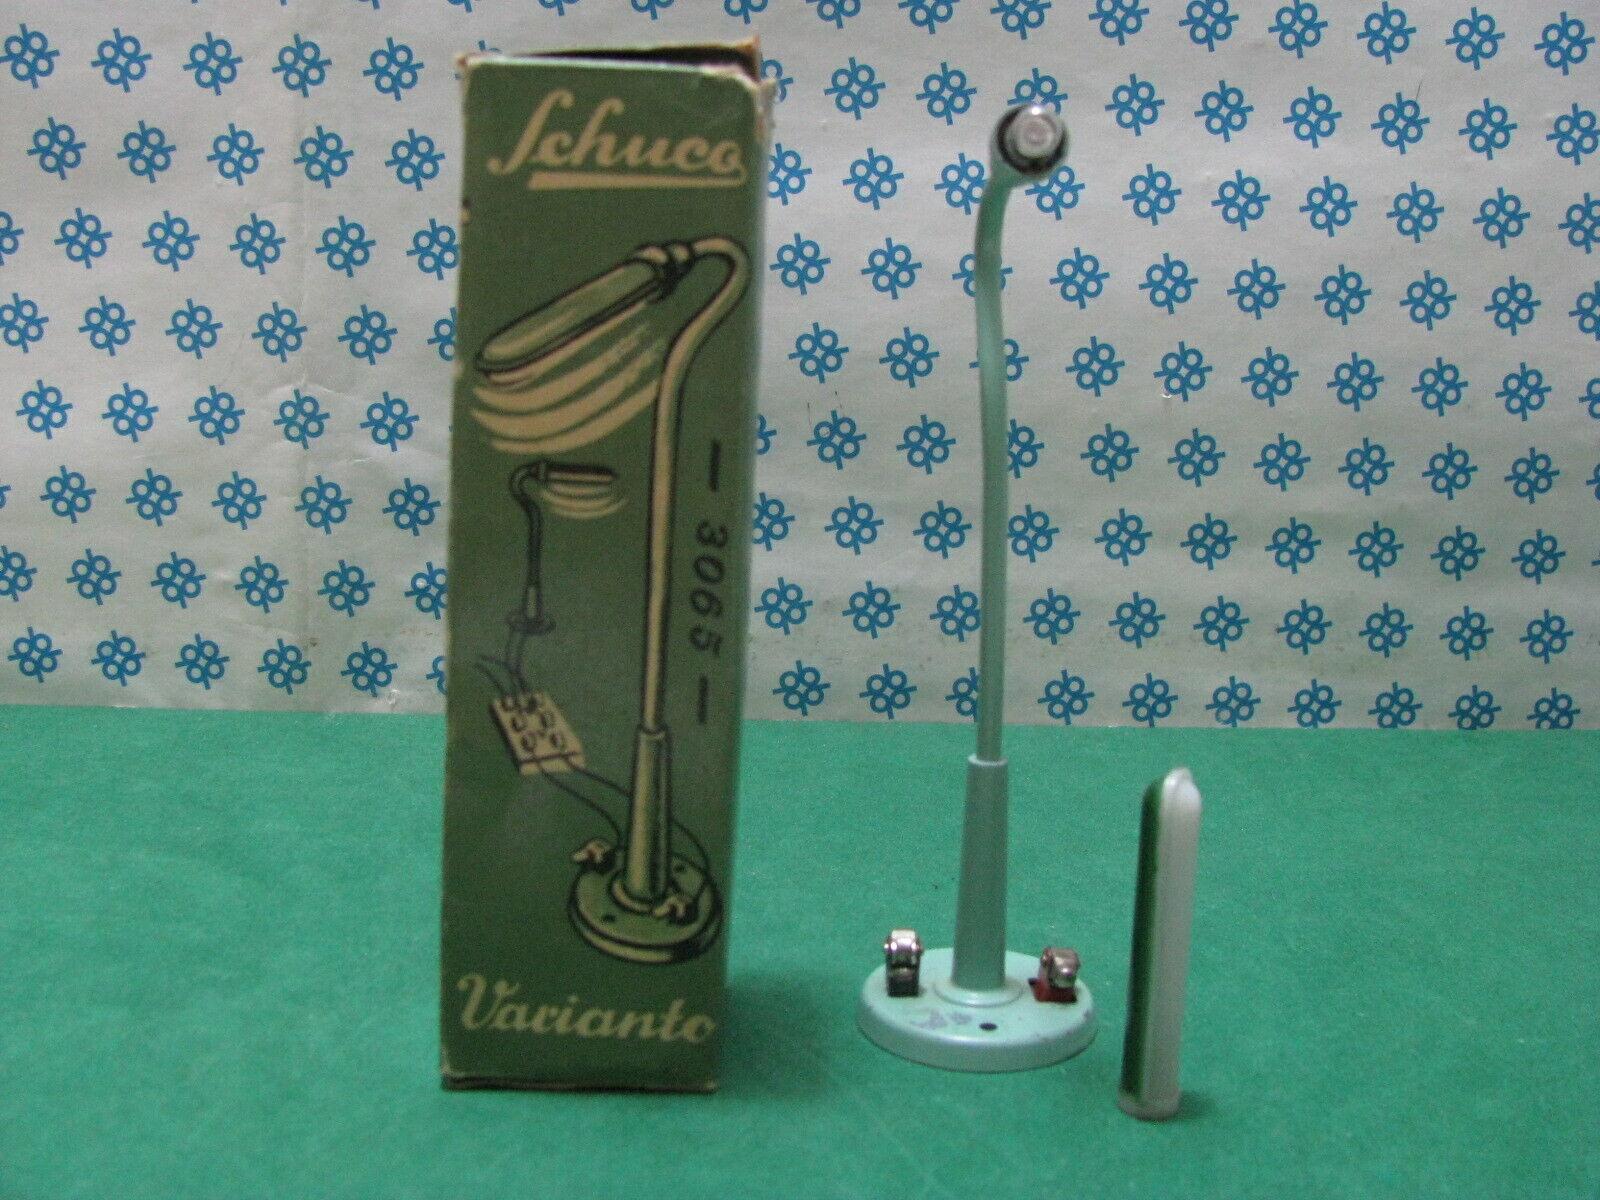 Vintage - SCHUCO Varianto 3065 STREET LIGHT - U.S. Zone W. Germany 50 Jahre